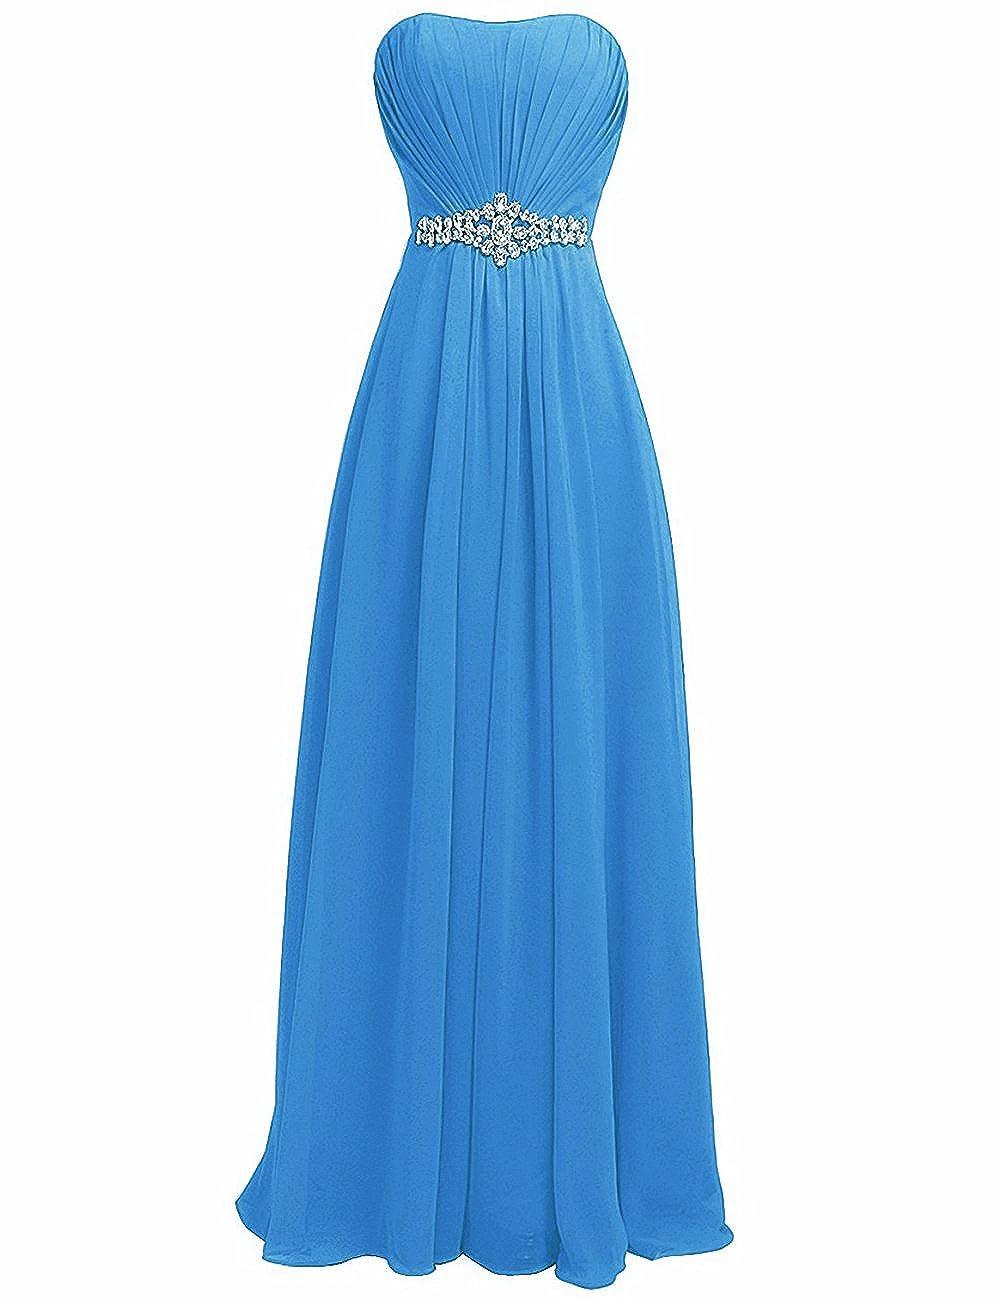 bluee H.S.D Women's Strapless Rhinestone Sash Long Bridesmaid Dress Evening Gown